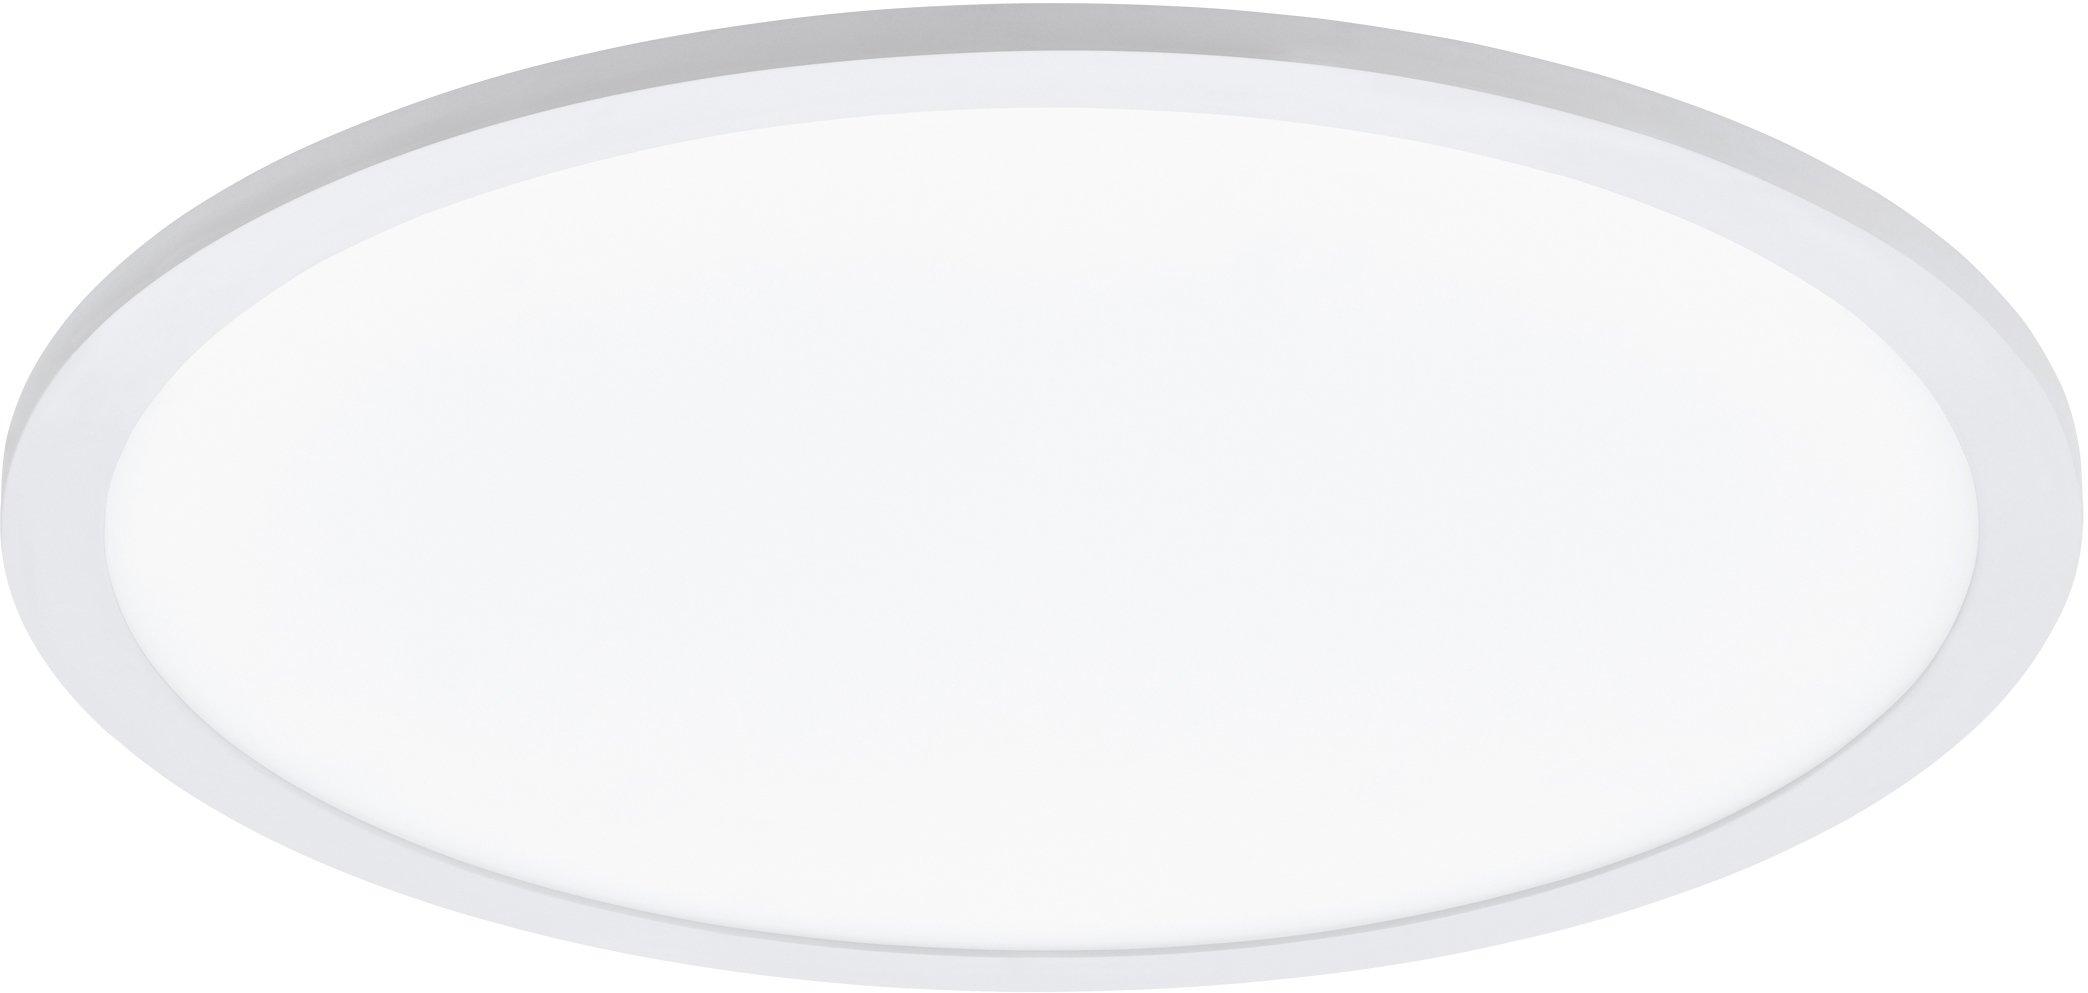 EGLO plafondlamp SARSINA-C EGLO CONNECT, bediening via app + afstandsbediening, BLE, CCT, RGB goedkoop op otto.nl kopen